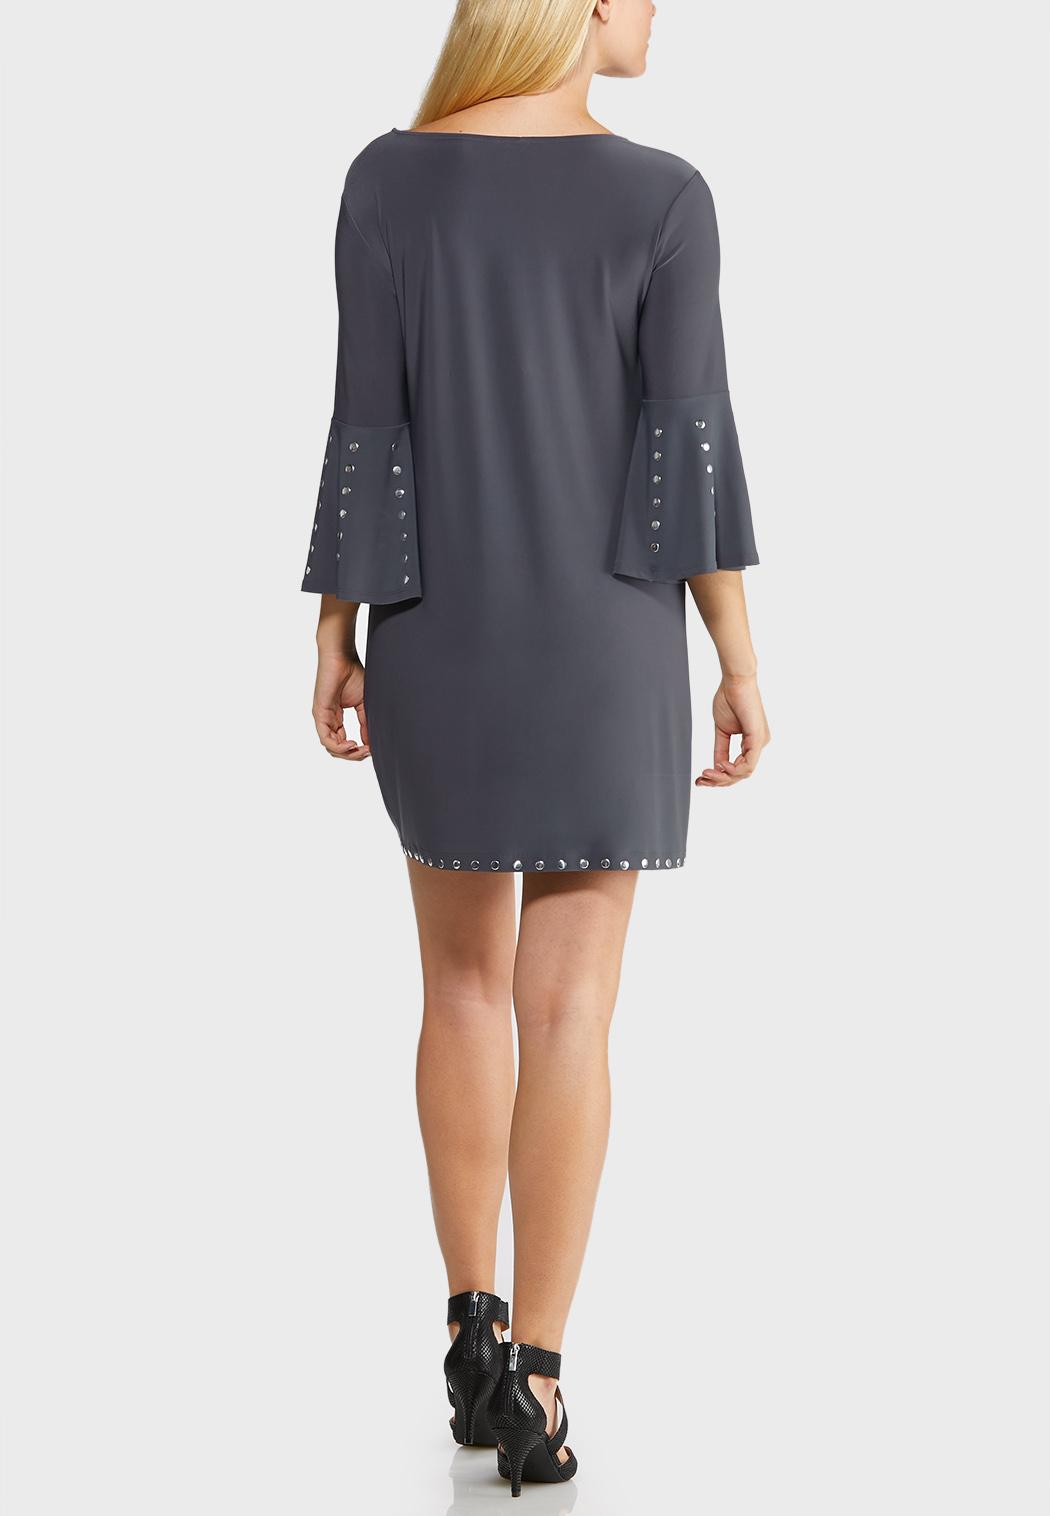 Plus Size Studded Shift Dress (Item #43947934)